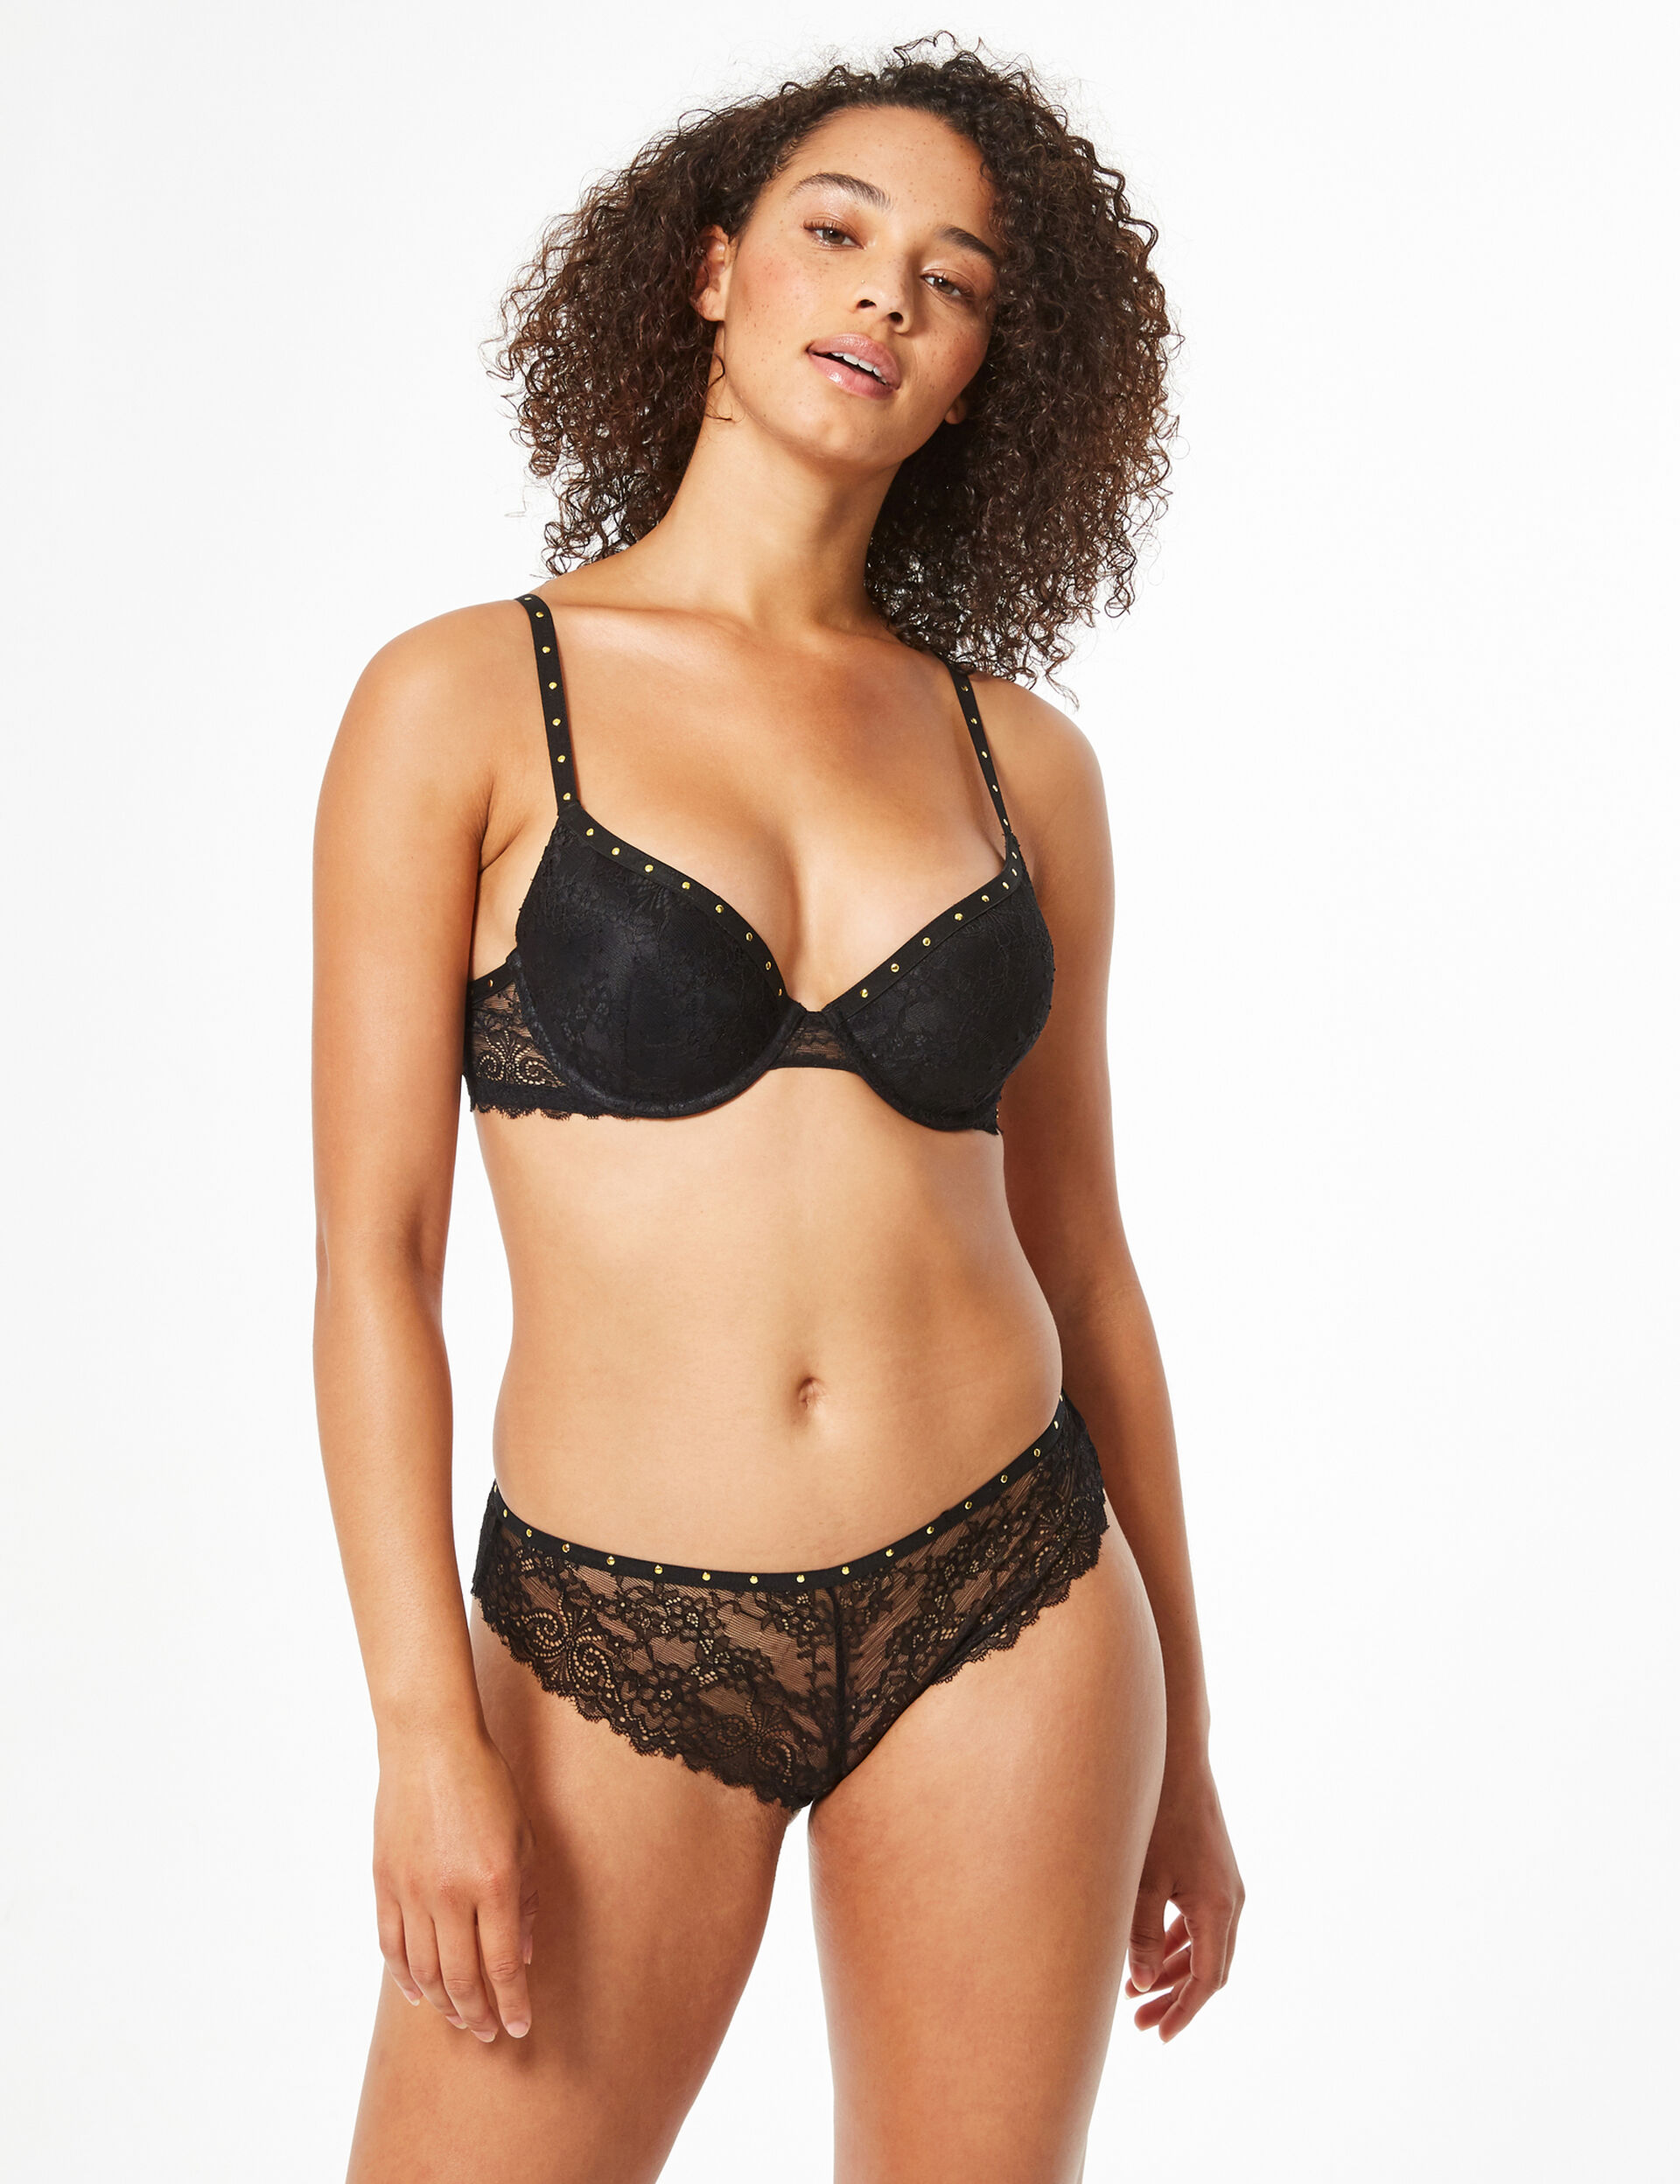 Push-up lace bra with rhinestones